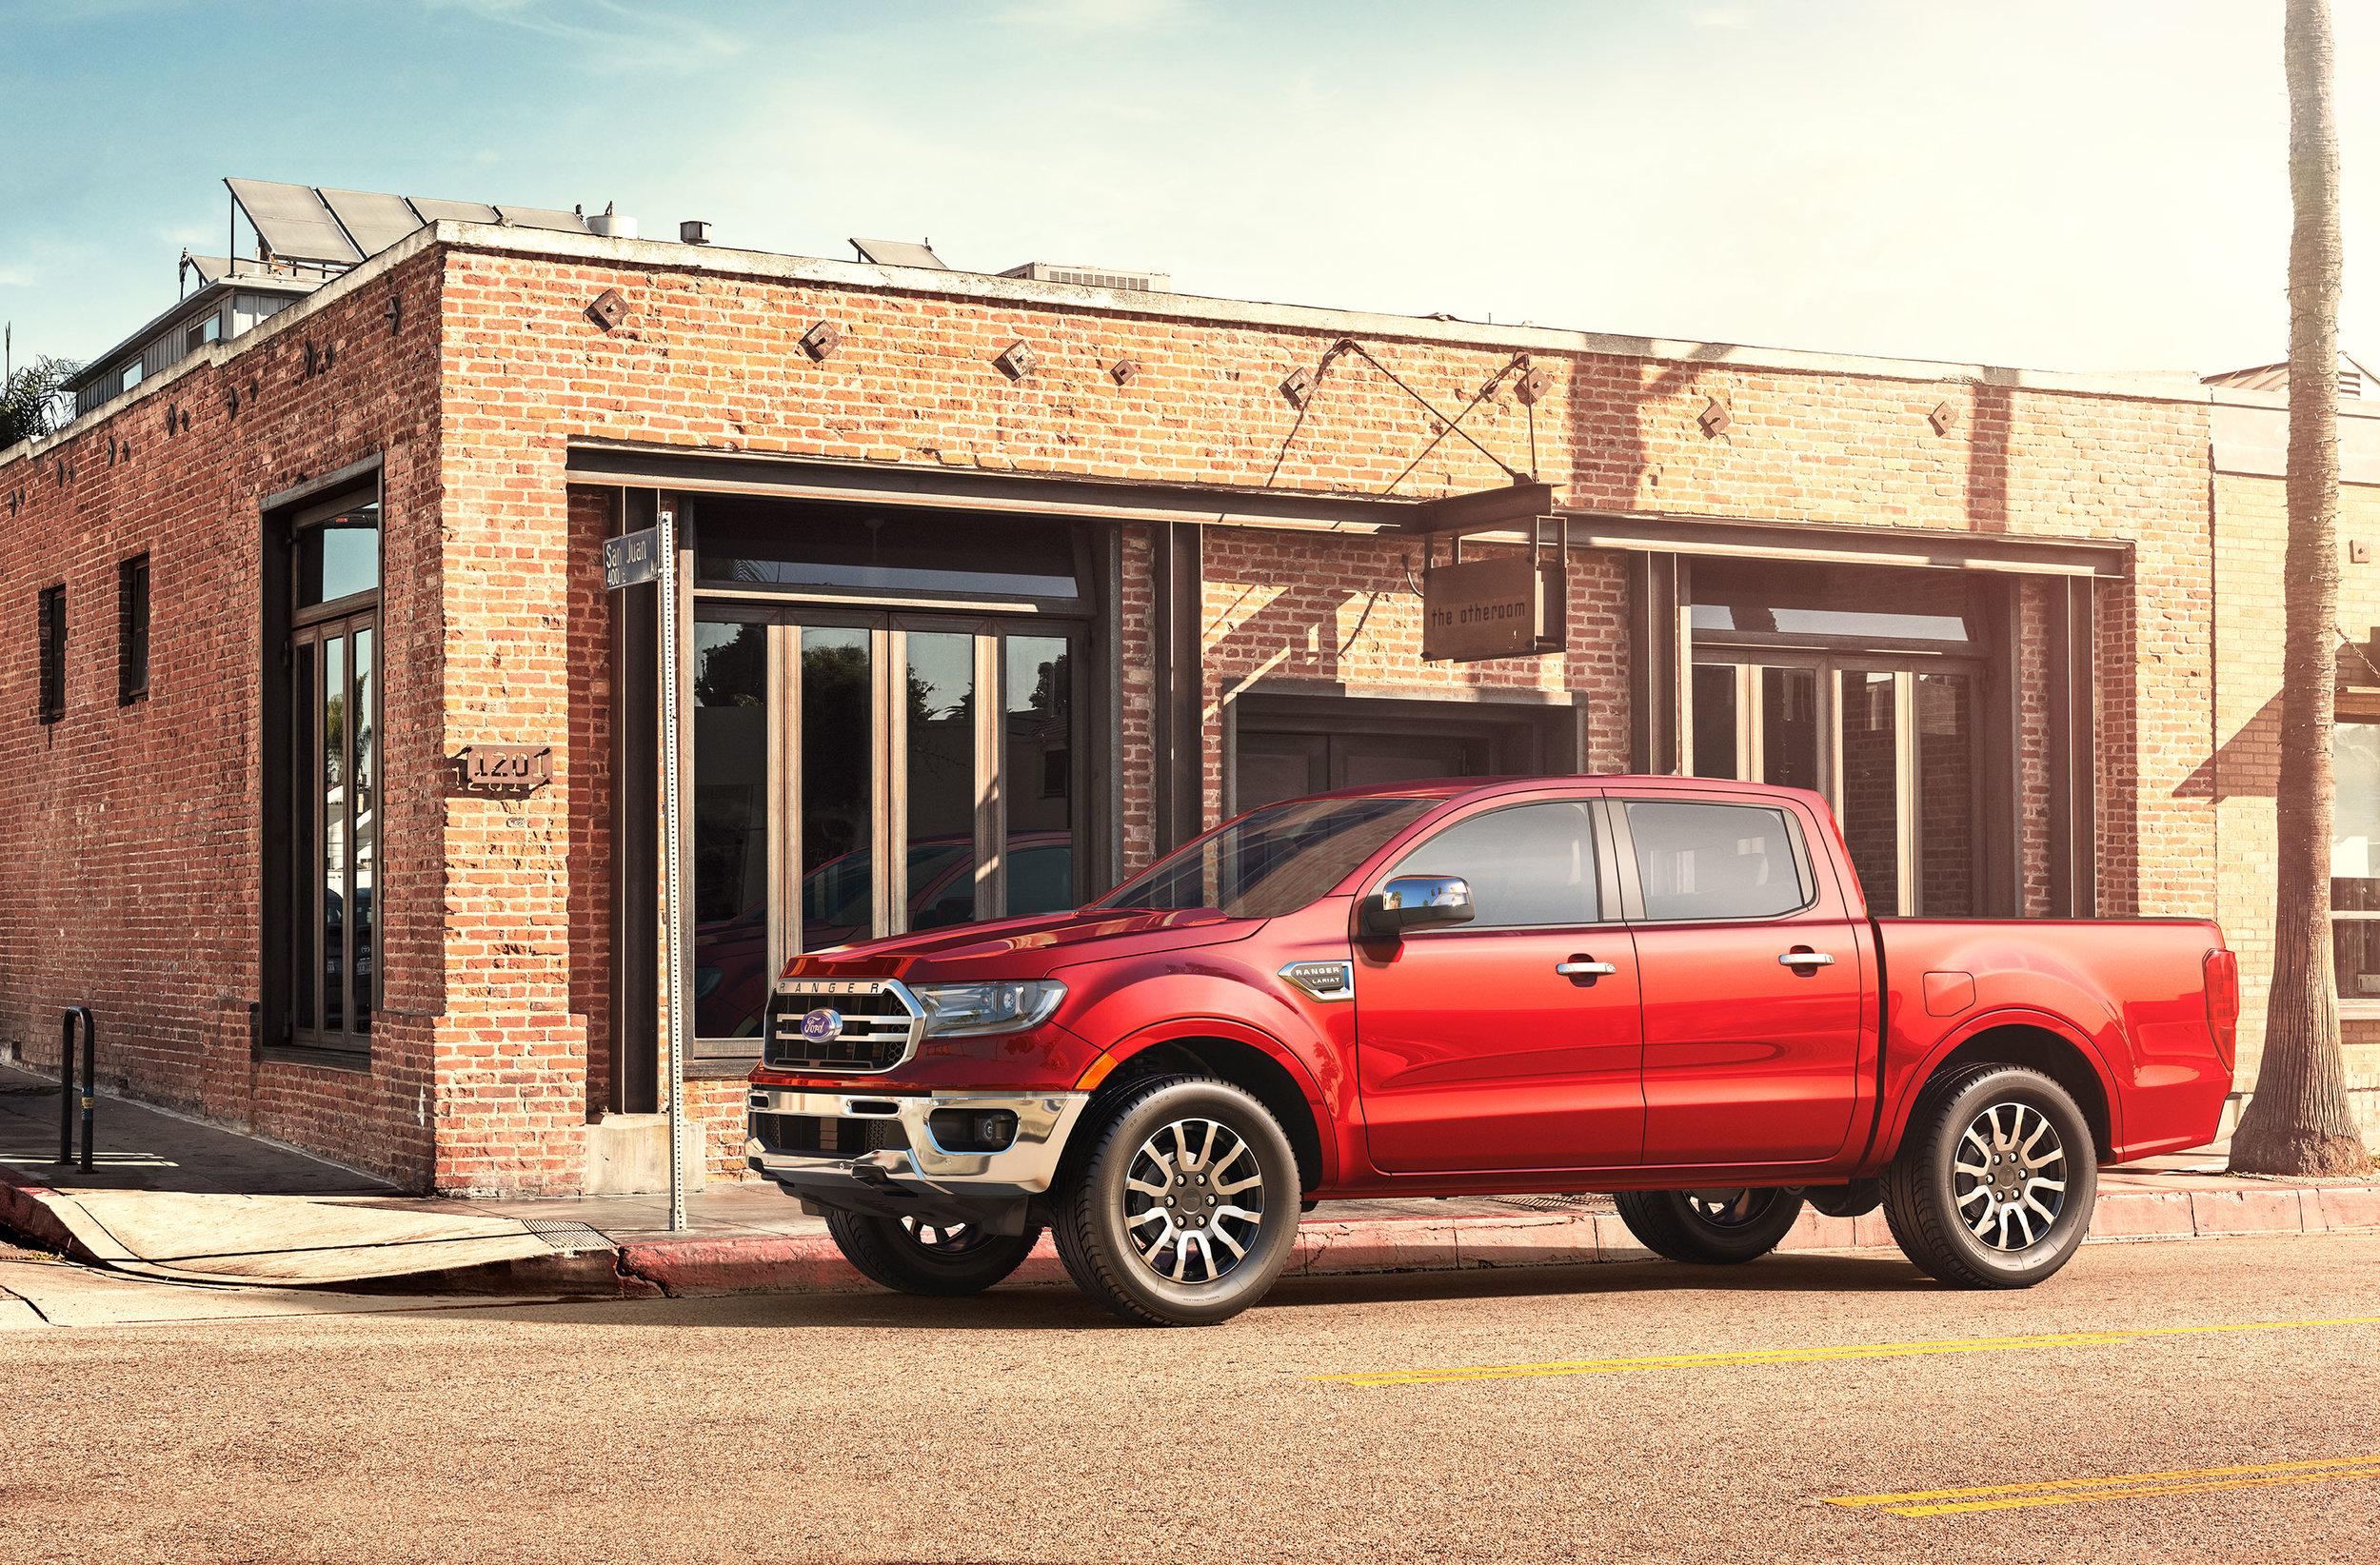 Ford_Ranger_2019_US_03b_sRGB_web.jpg